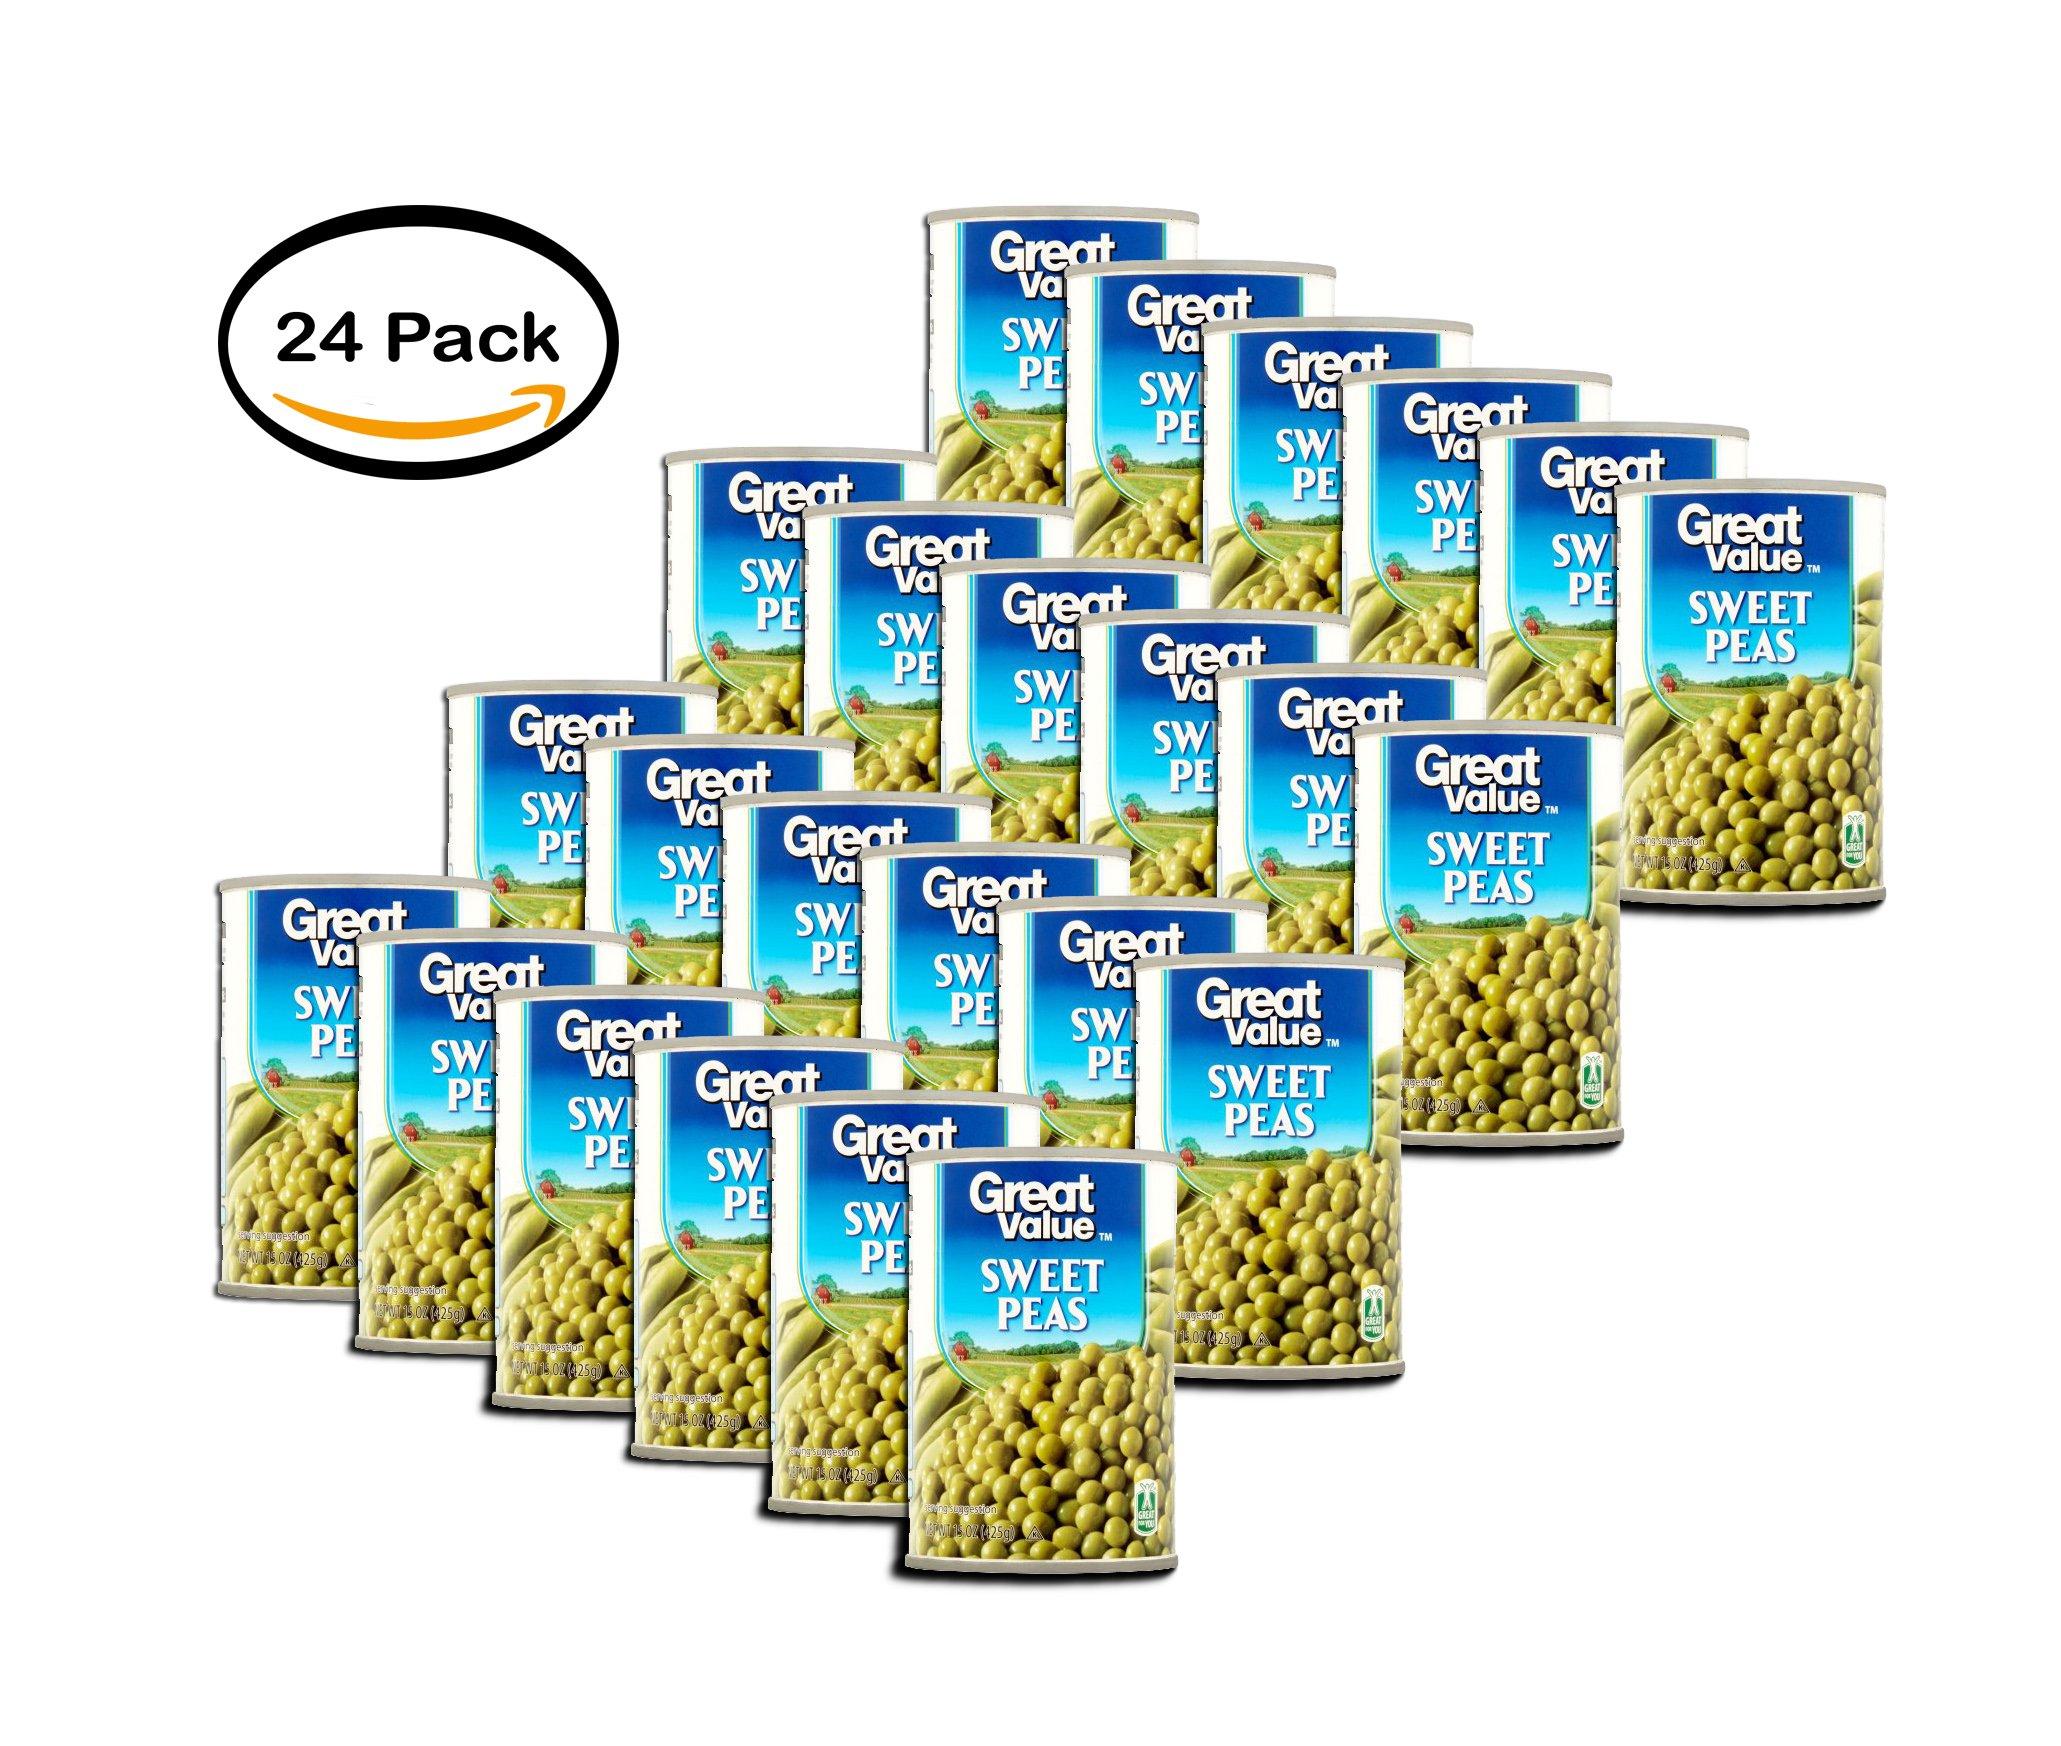 PACK OF 24 - Great Value Sweet Peas, 15 oz